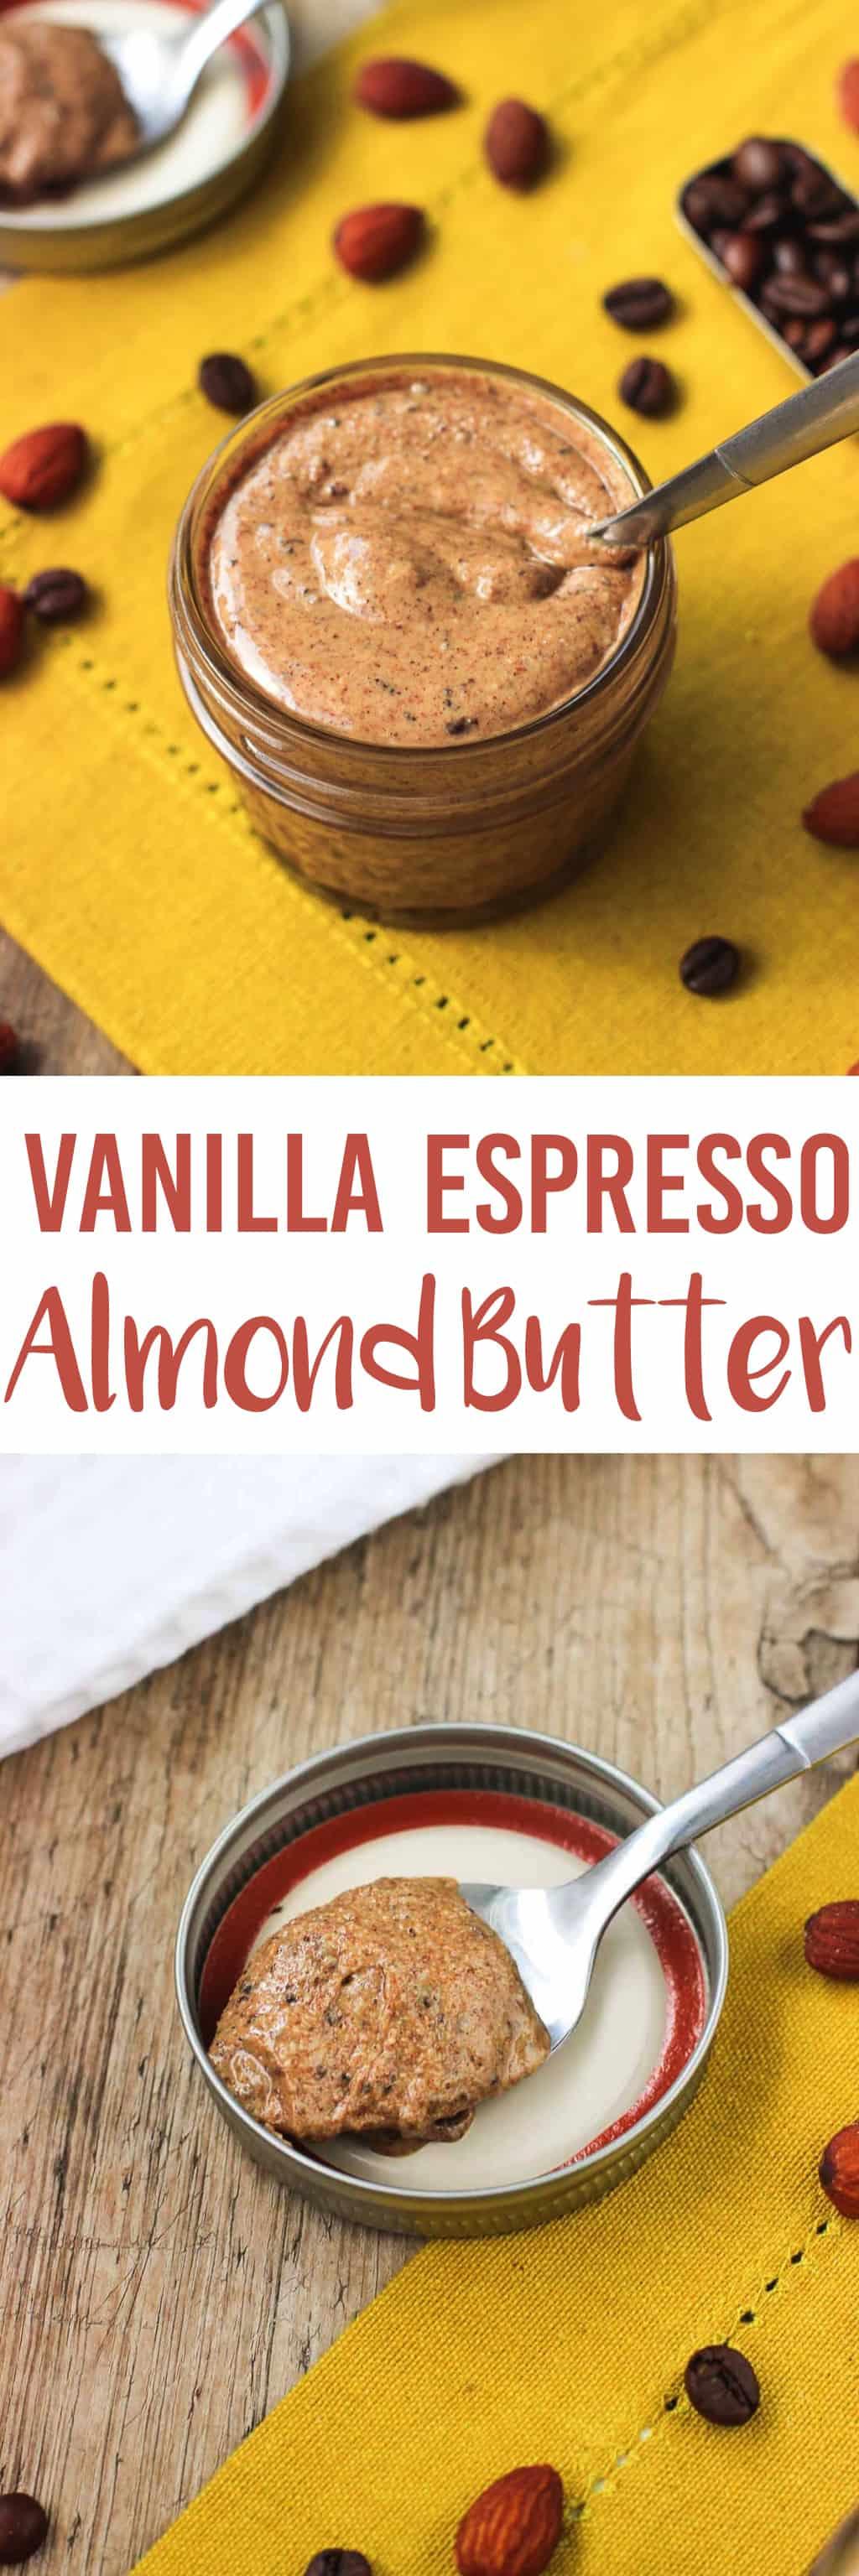 Vanilla Espresso Almond Butter | mysequinedlife.com